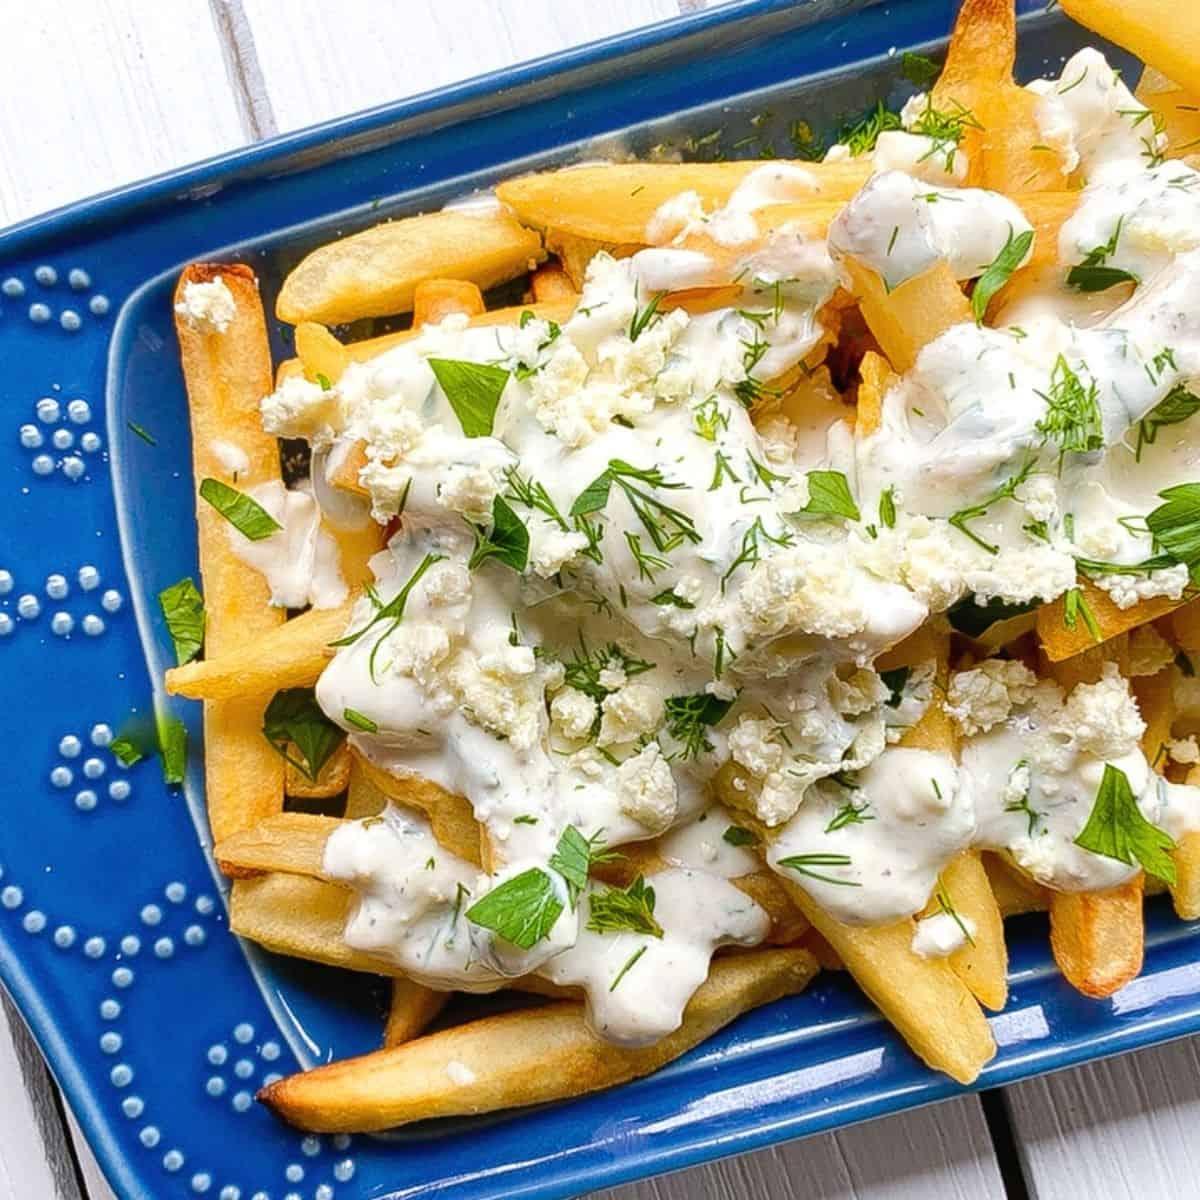 greek feta cheese fries on a blue plate